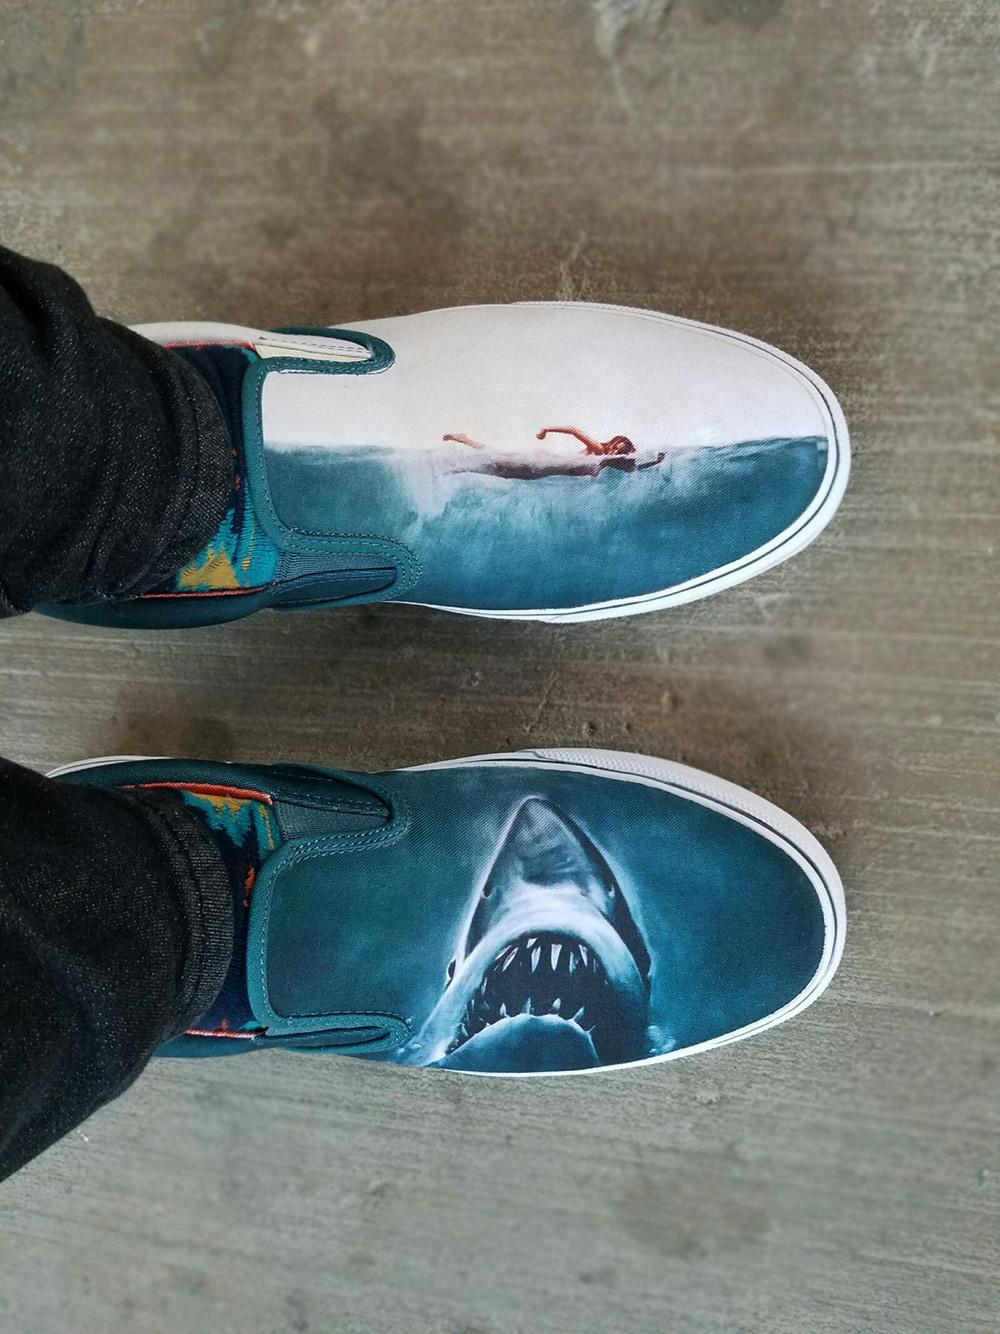 Sperry x Jaws Striper Slip On on foot